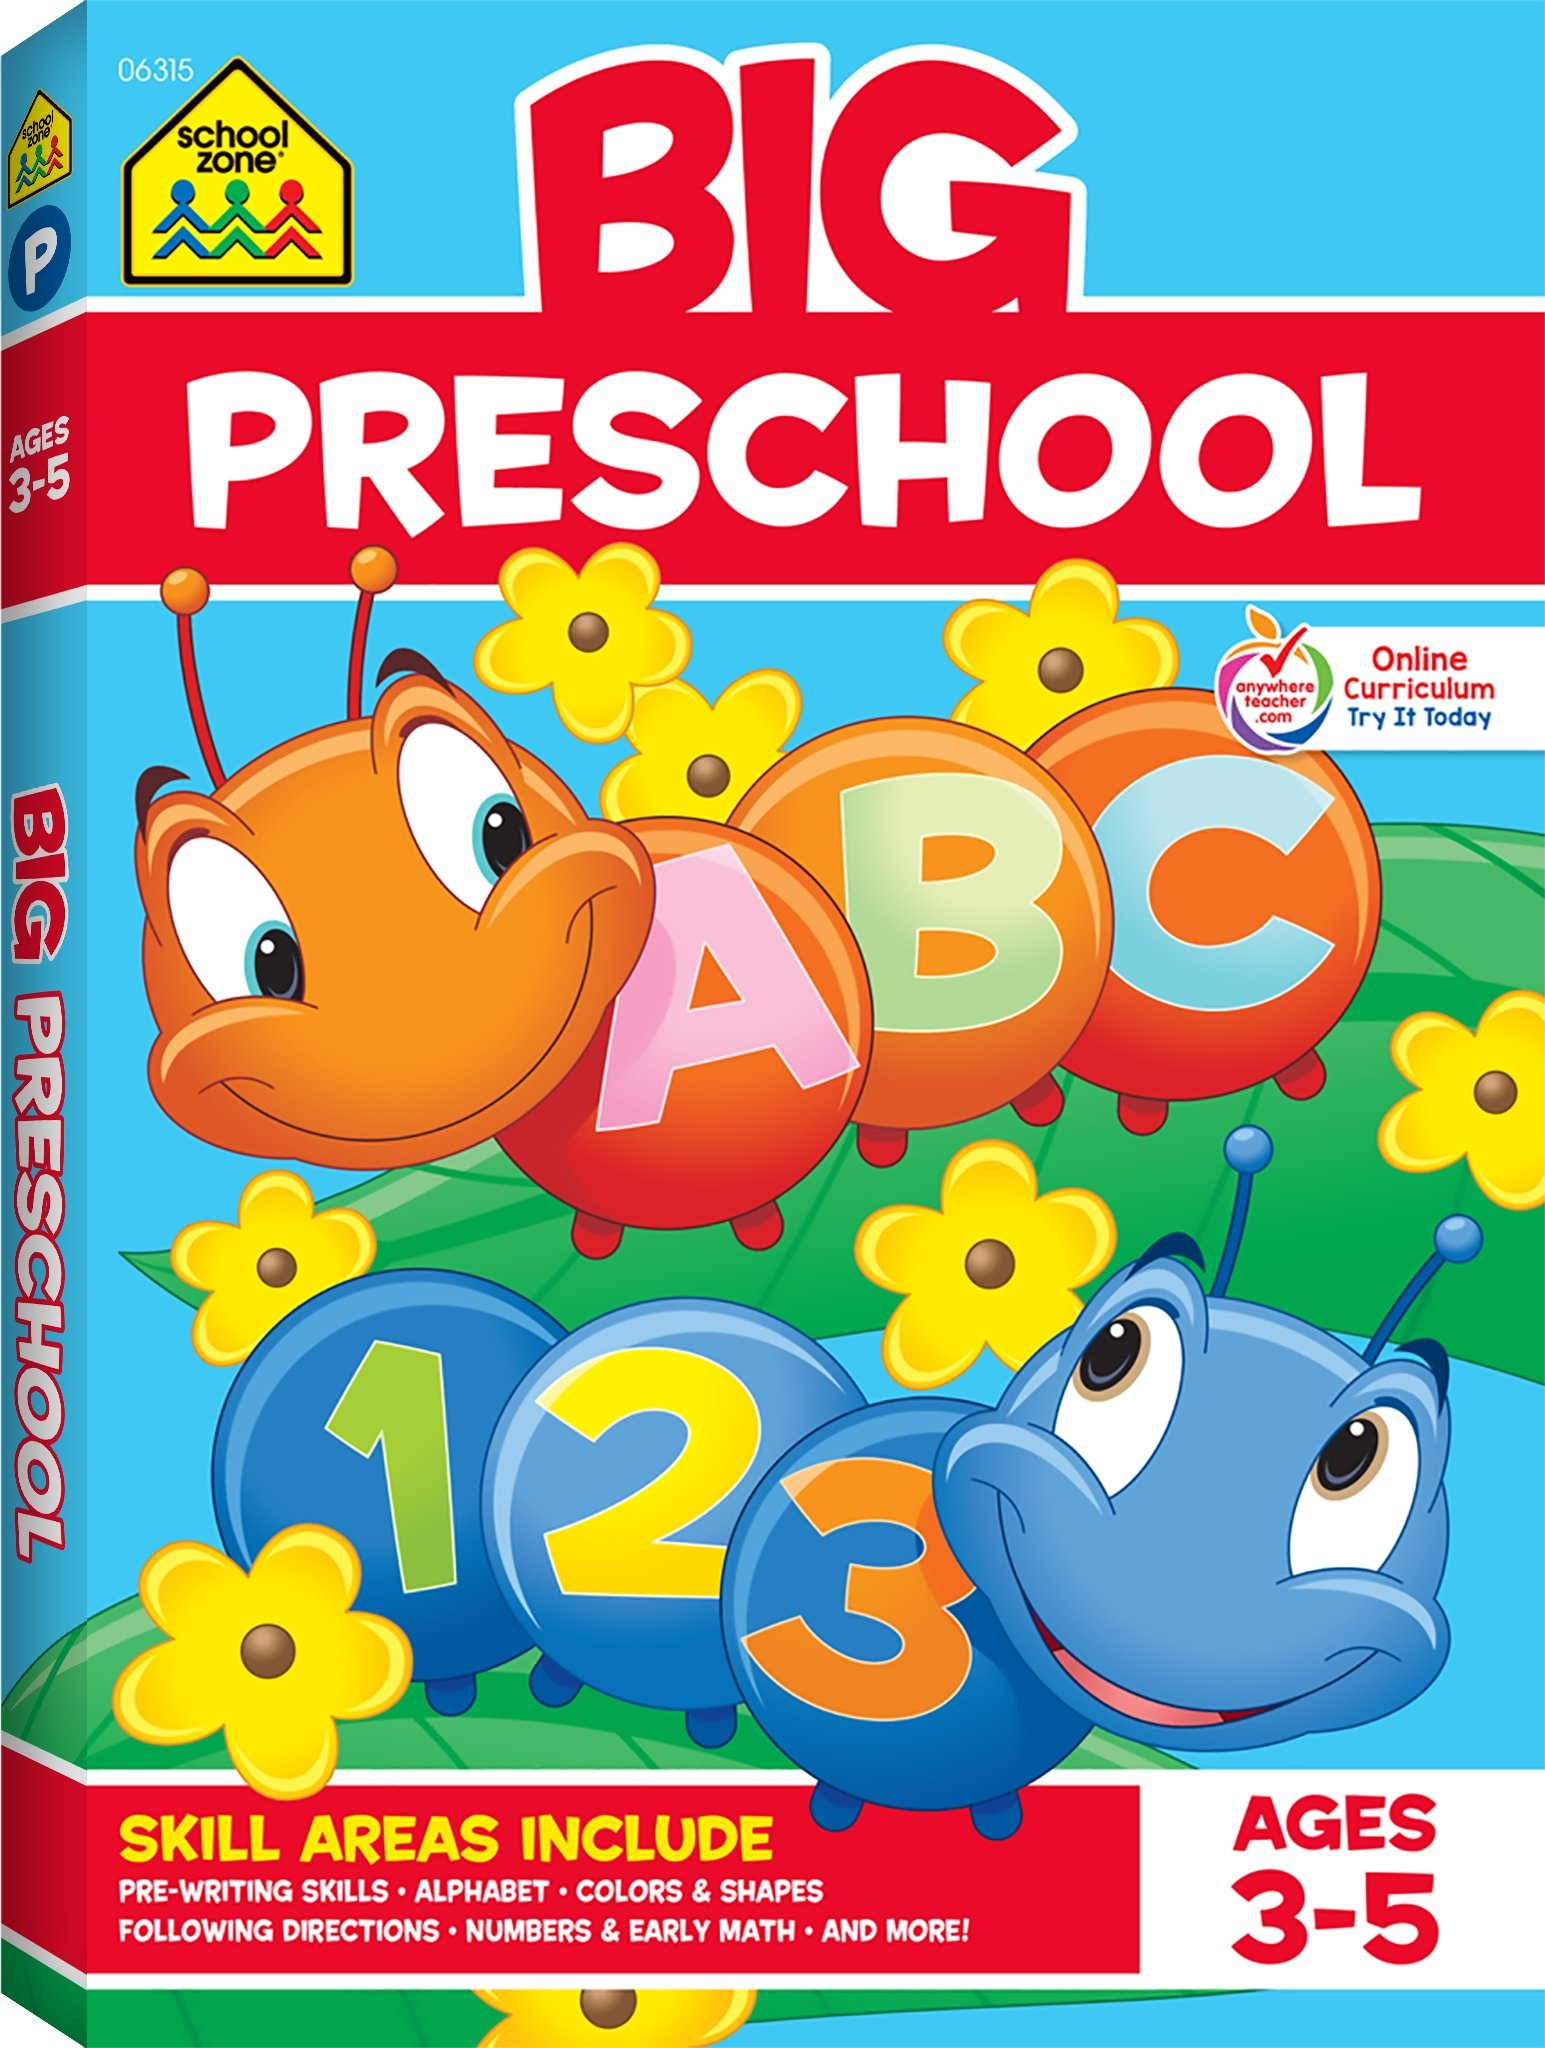 Cover image of School Zone: Big Preschool Workbook by School Zone & Joan Hoffman